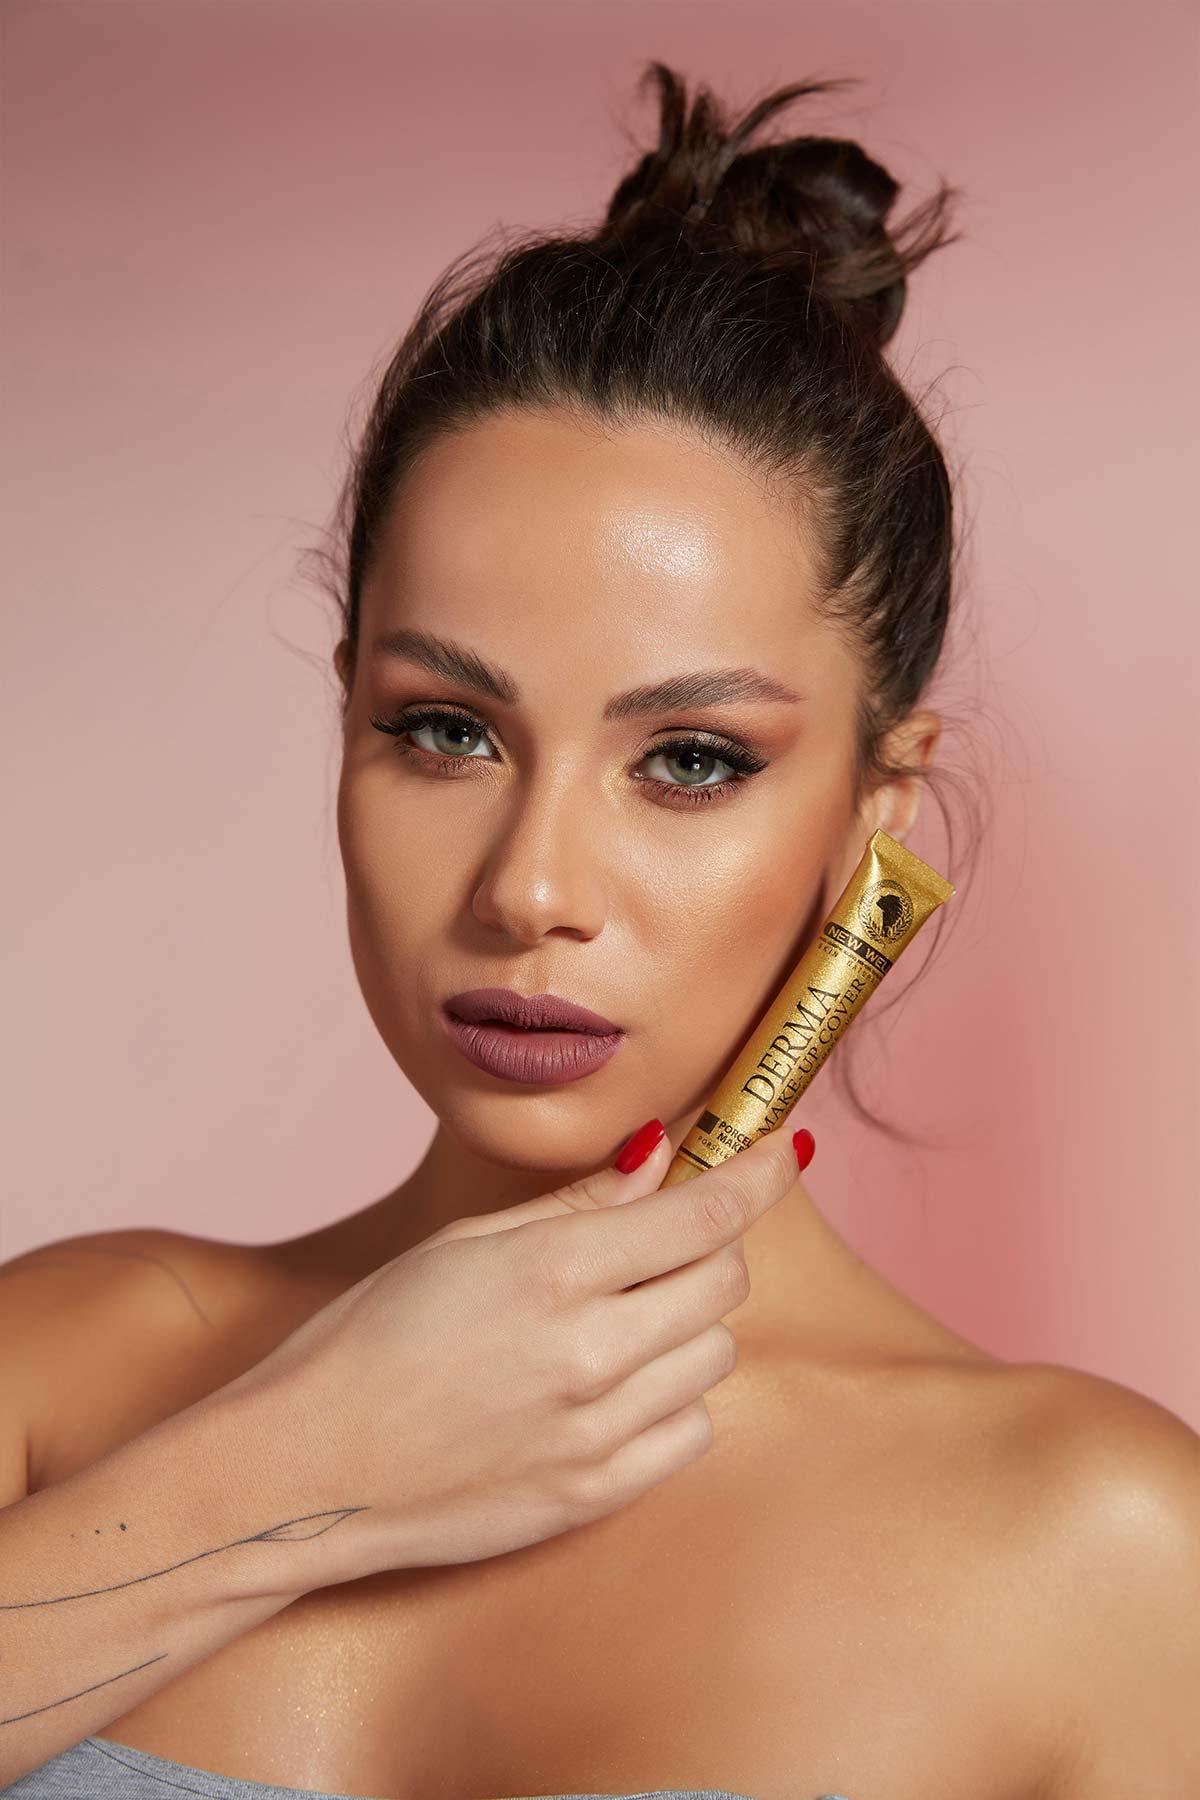 Derma Make-Up Cover Foundation - Bronze -Fondöten - Foundation Thumbnail